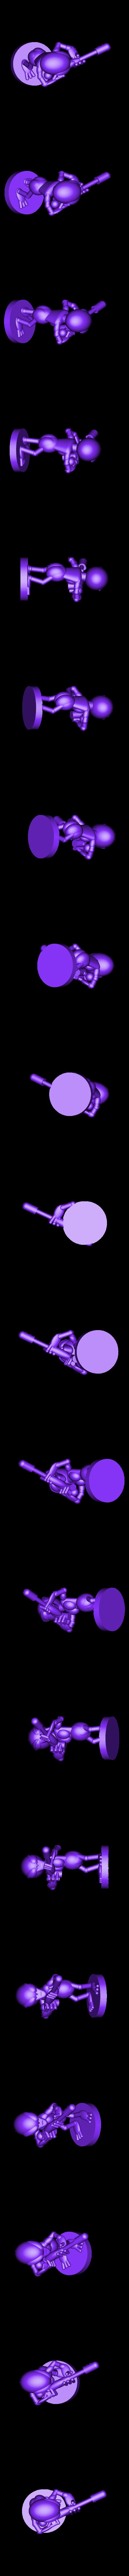 grey_rifle1.stl Download free STL file The Grey Raid • Model to 3D print, Earsling